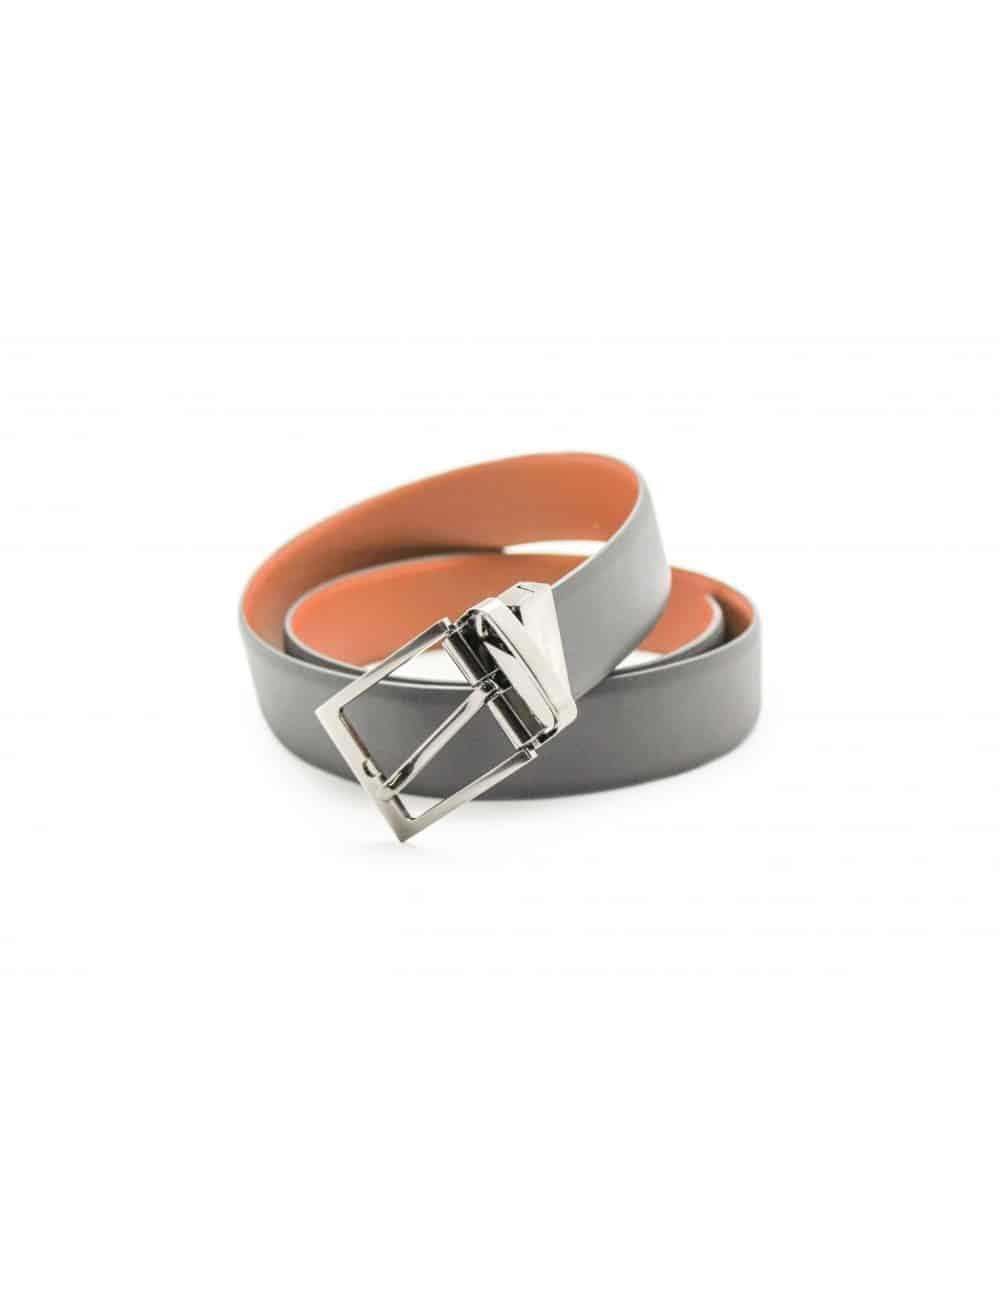 Grey / Tan Reversible Leather Belt LBR8.5